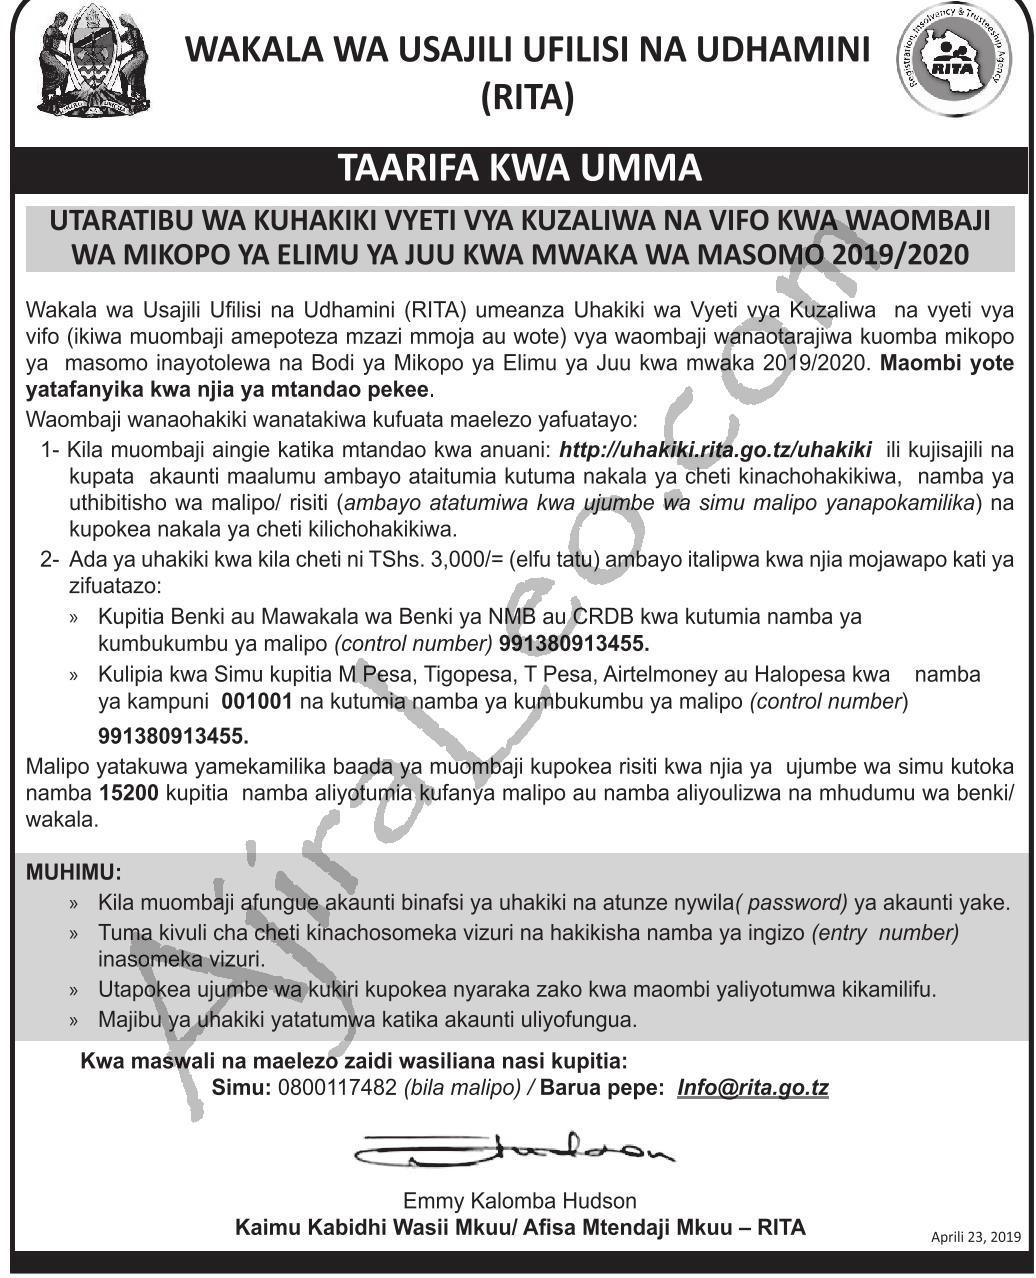 RITA UHAKIKI WA VYETI: Public Notice About Birth/Death Certificates